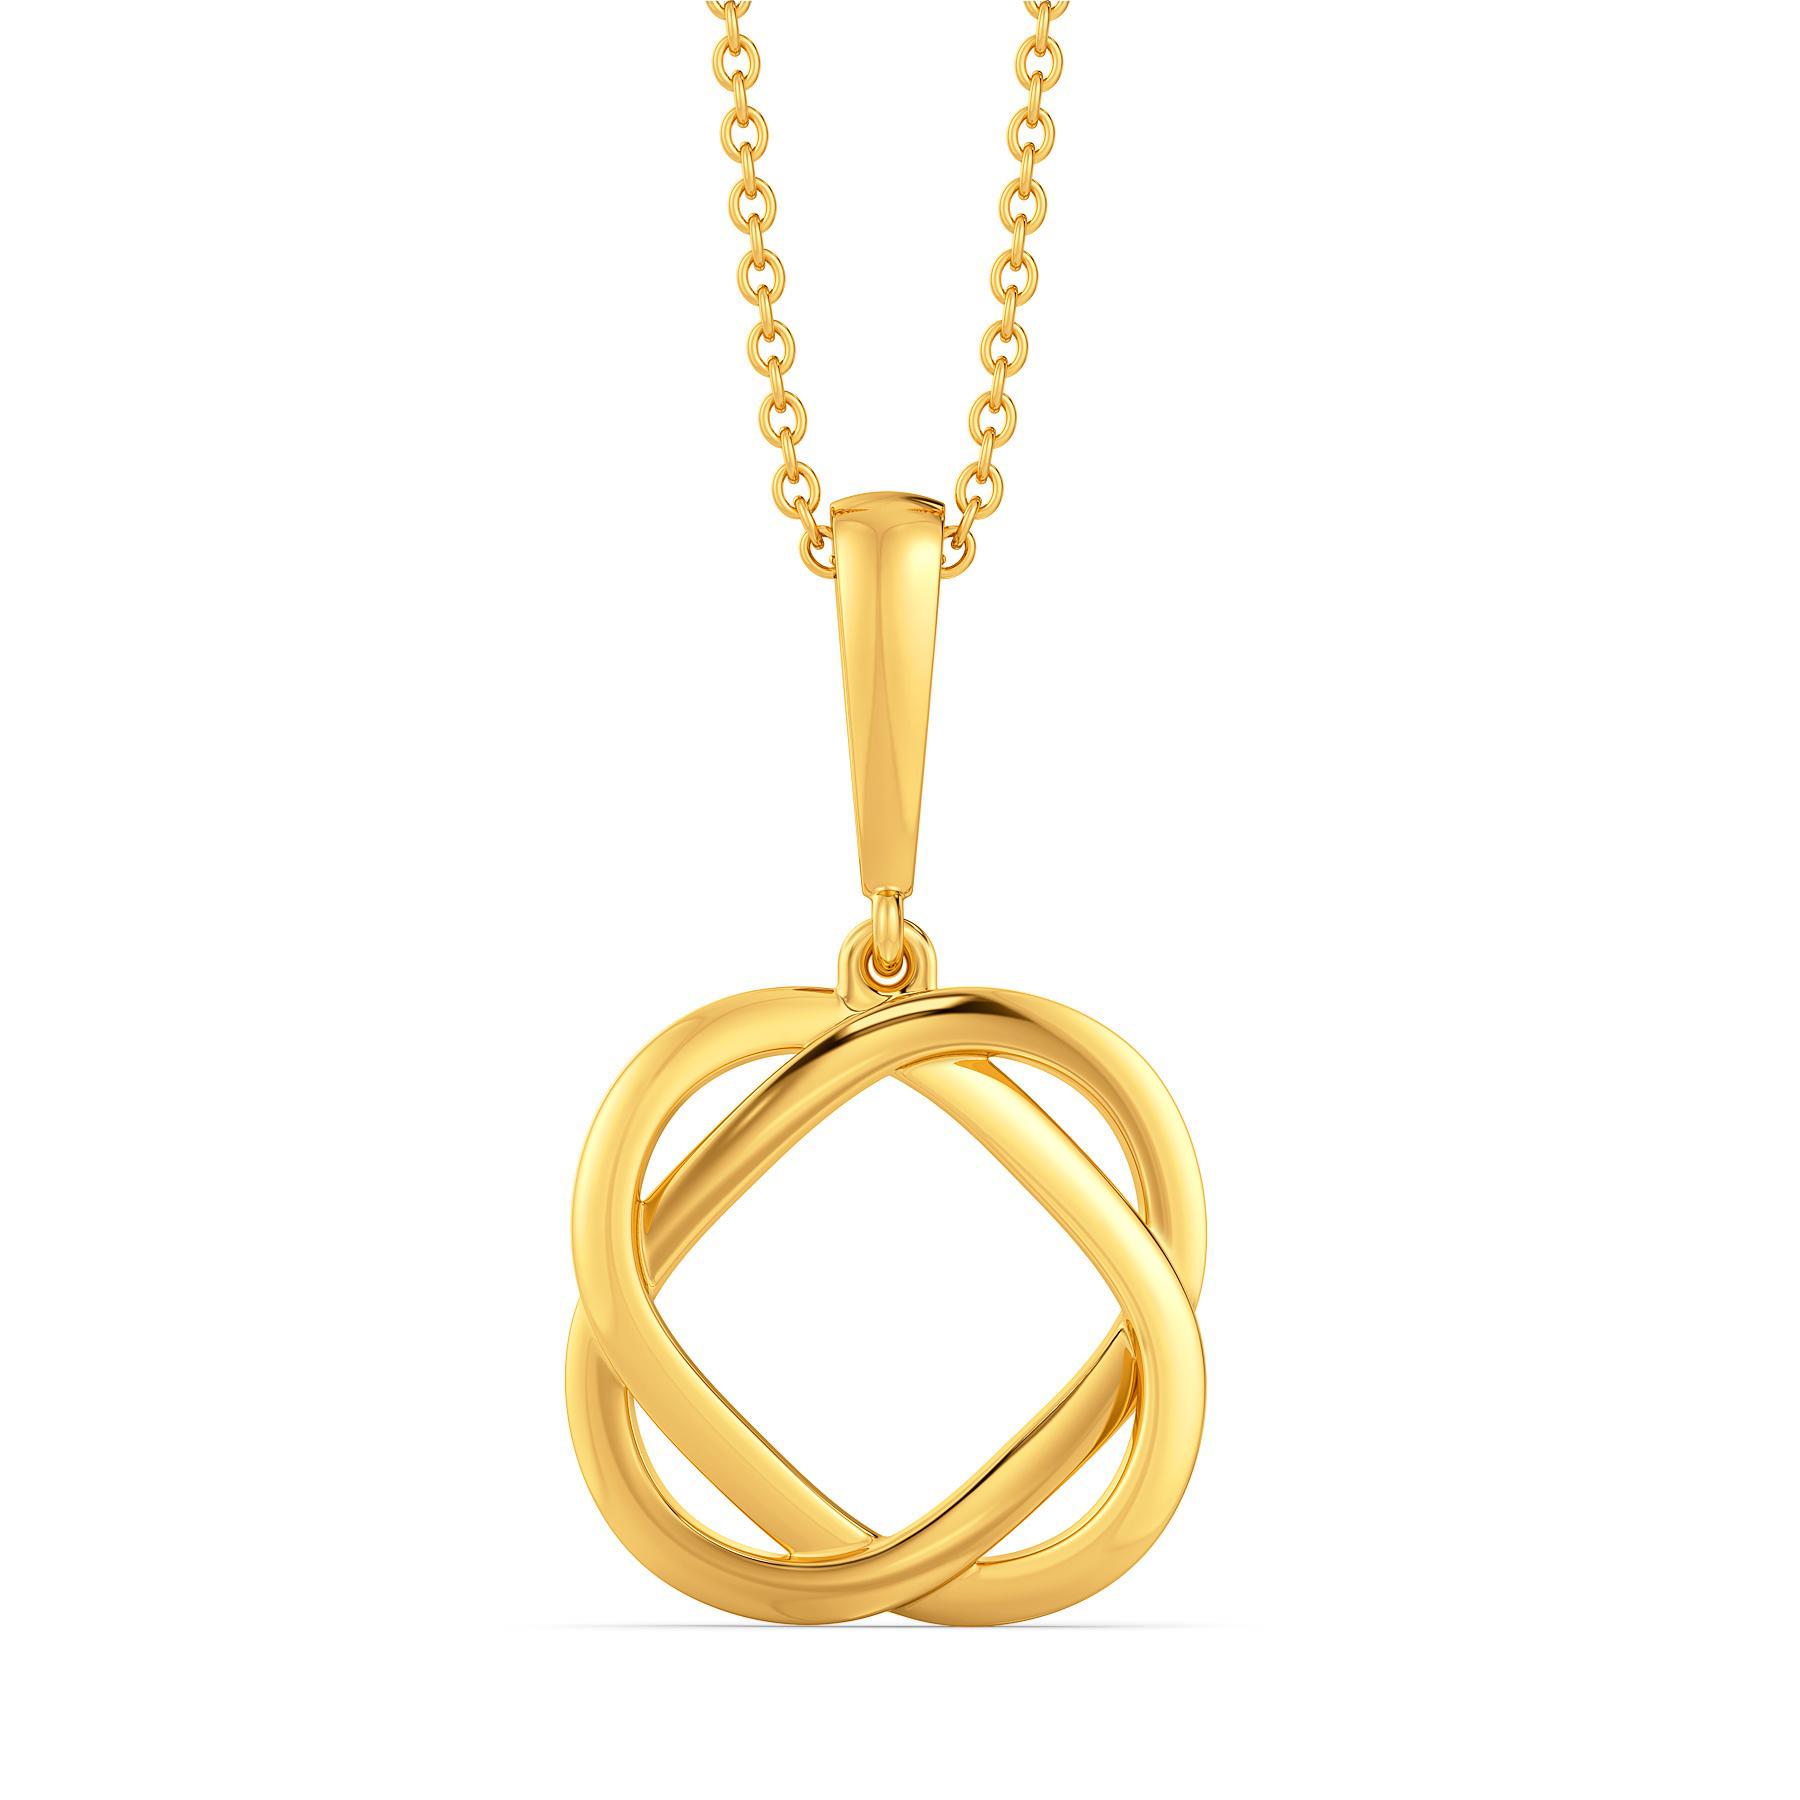 Bare to Bae Gold Pendants